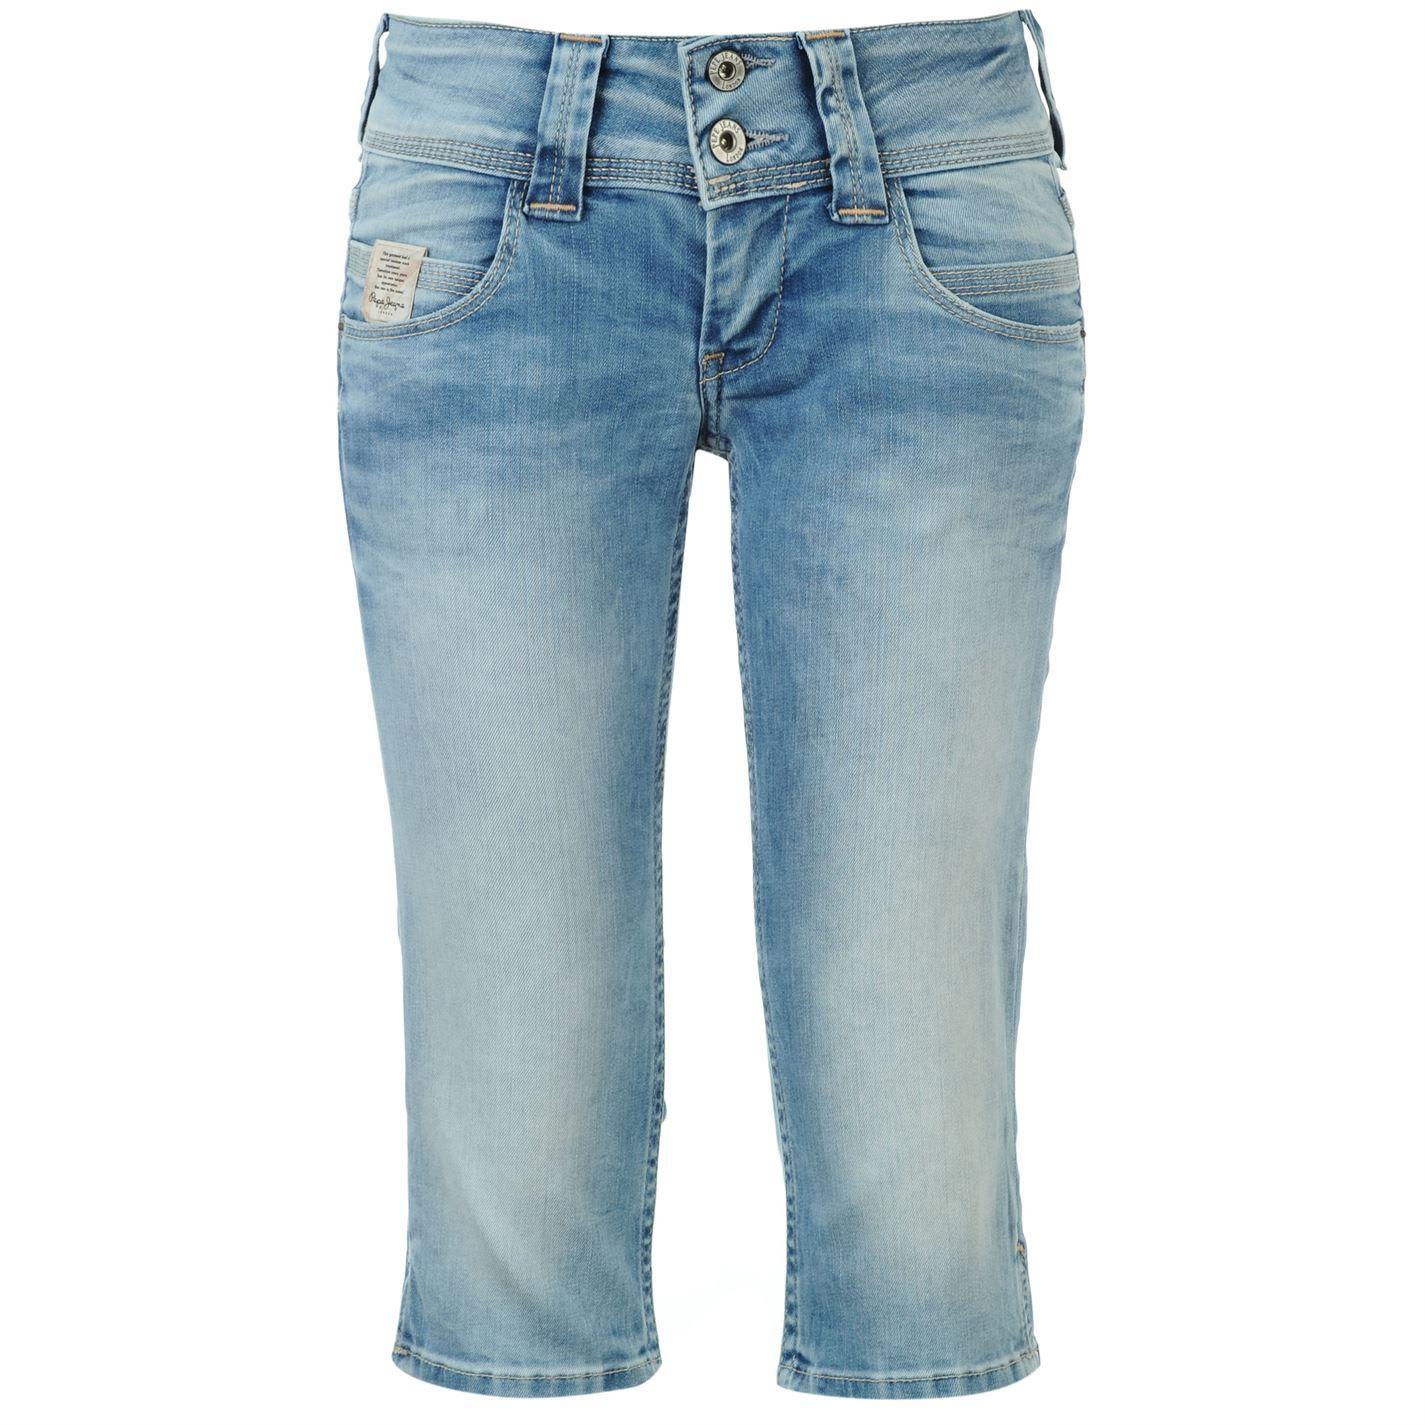 pepe jeans venus bermuda shorts casual bottoms ladies